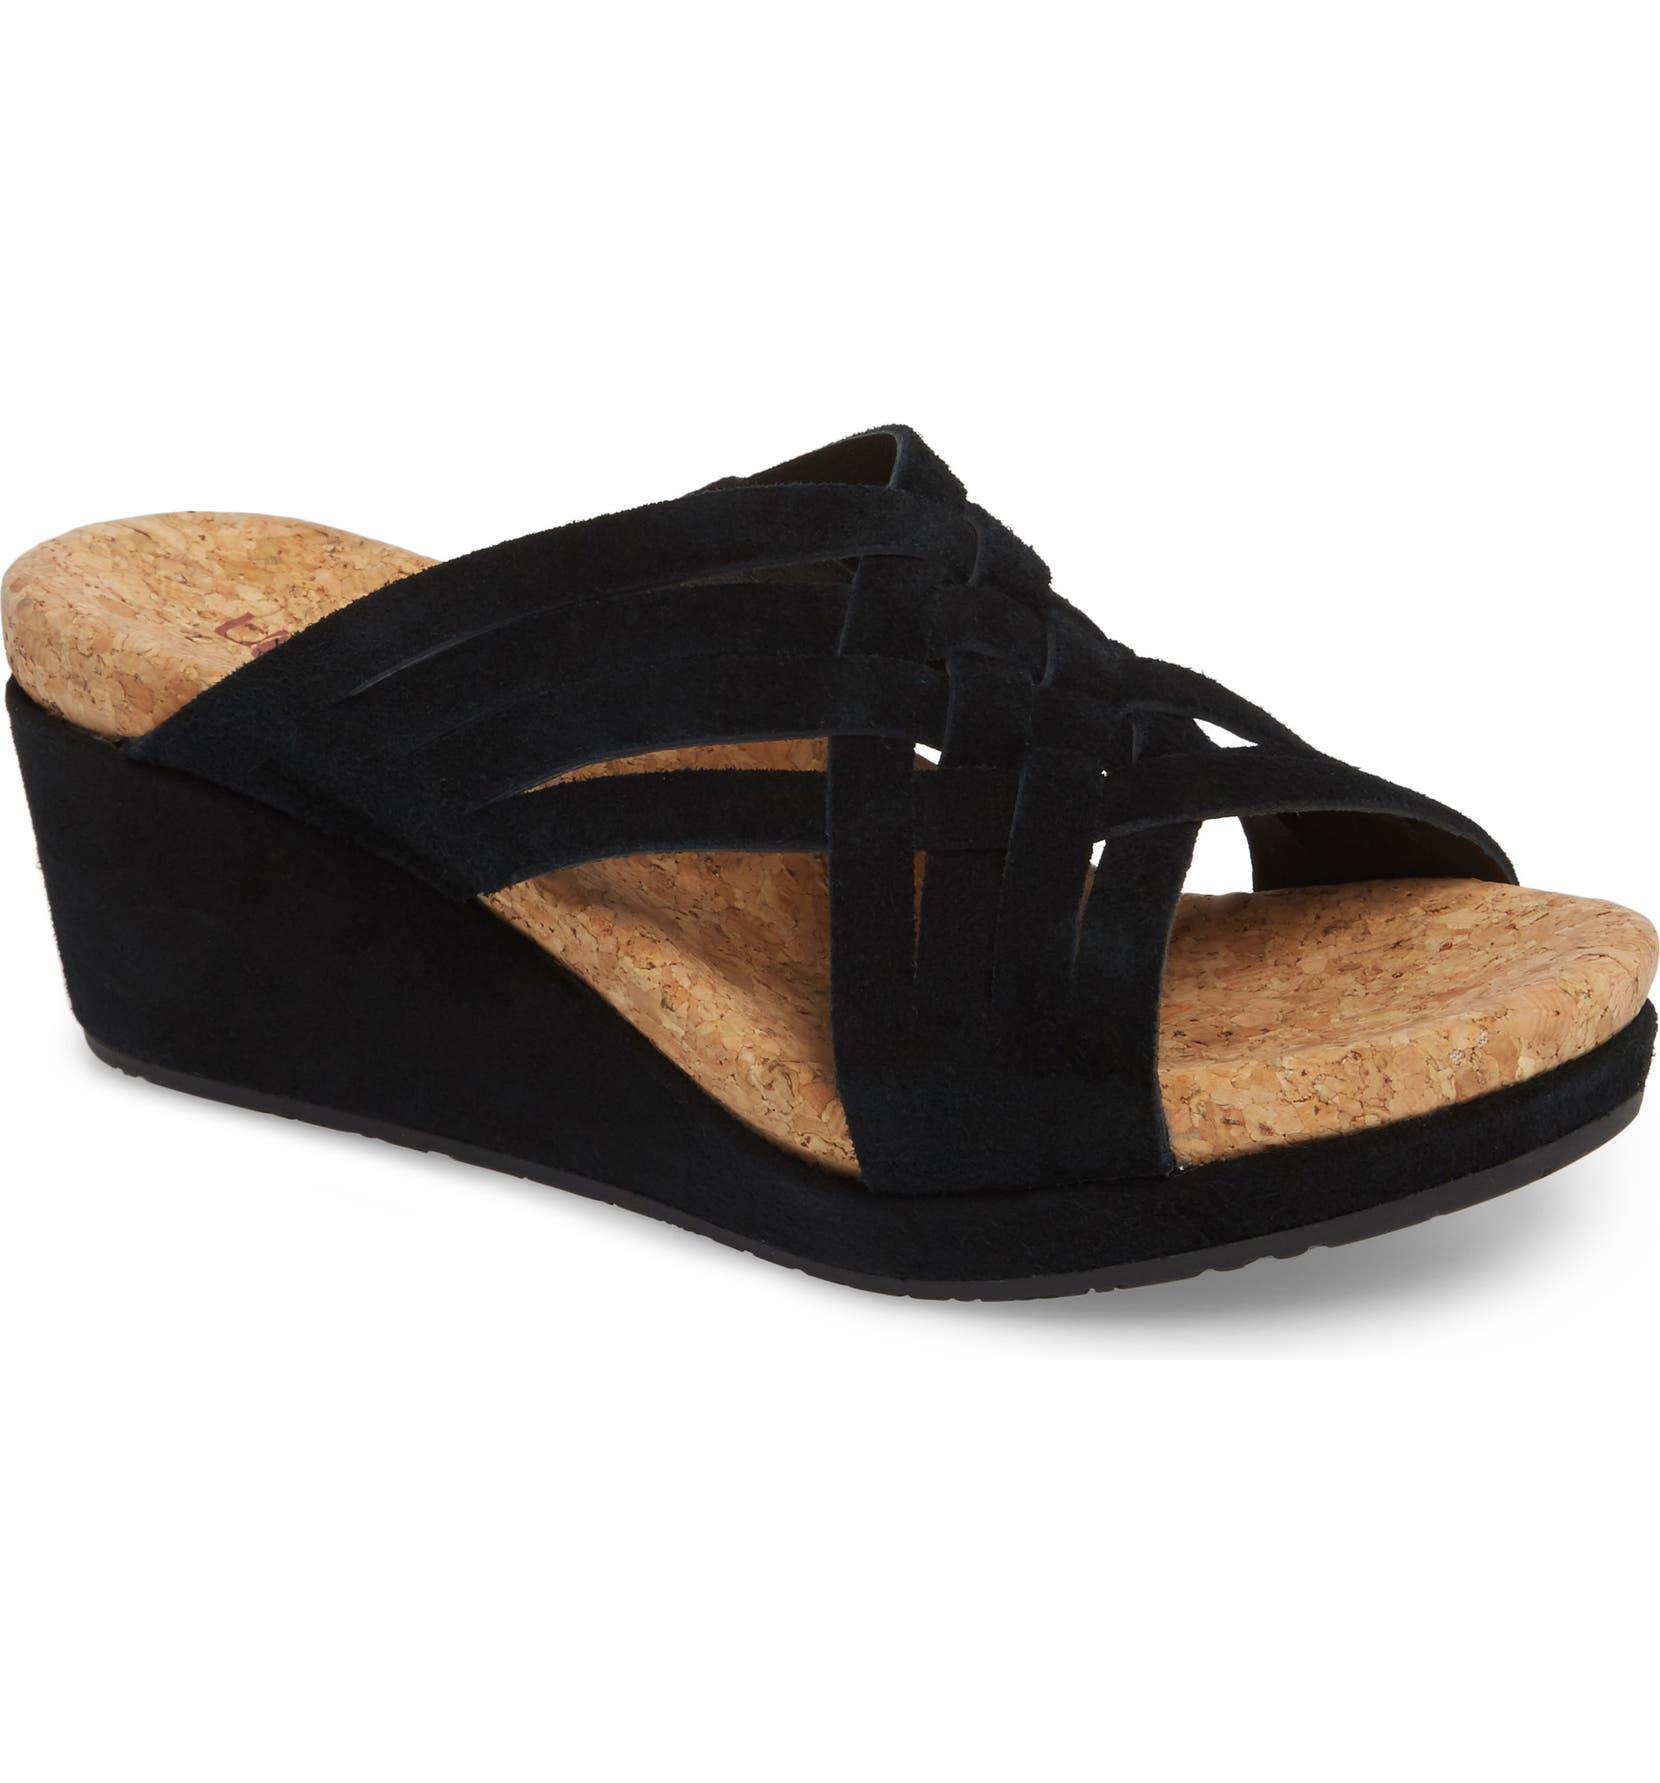 8deb82a0d7 UGG® Lilah Wedge Sandal (Women)   Nordstrom